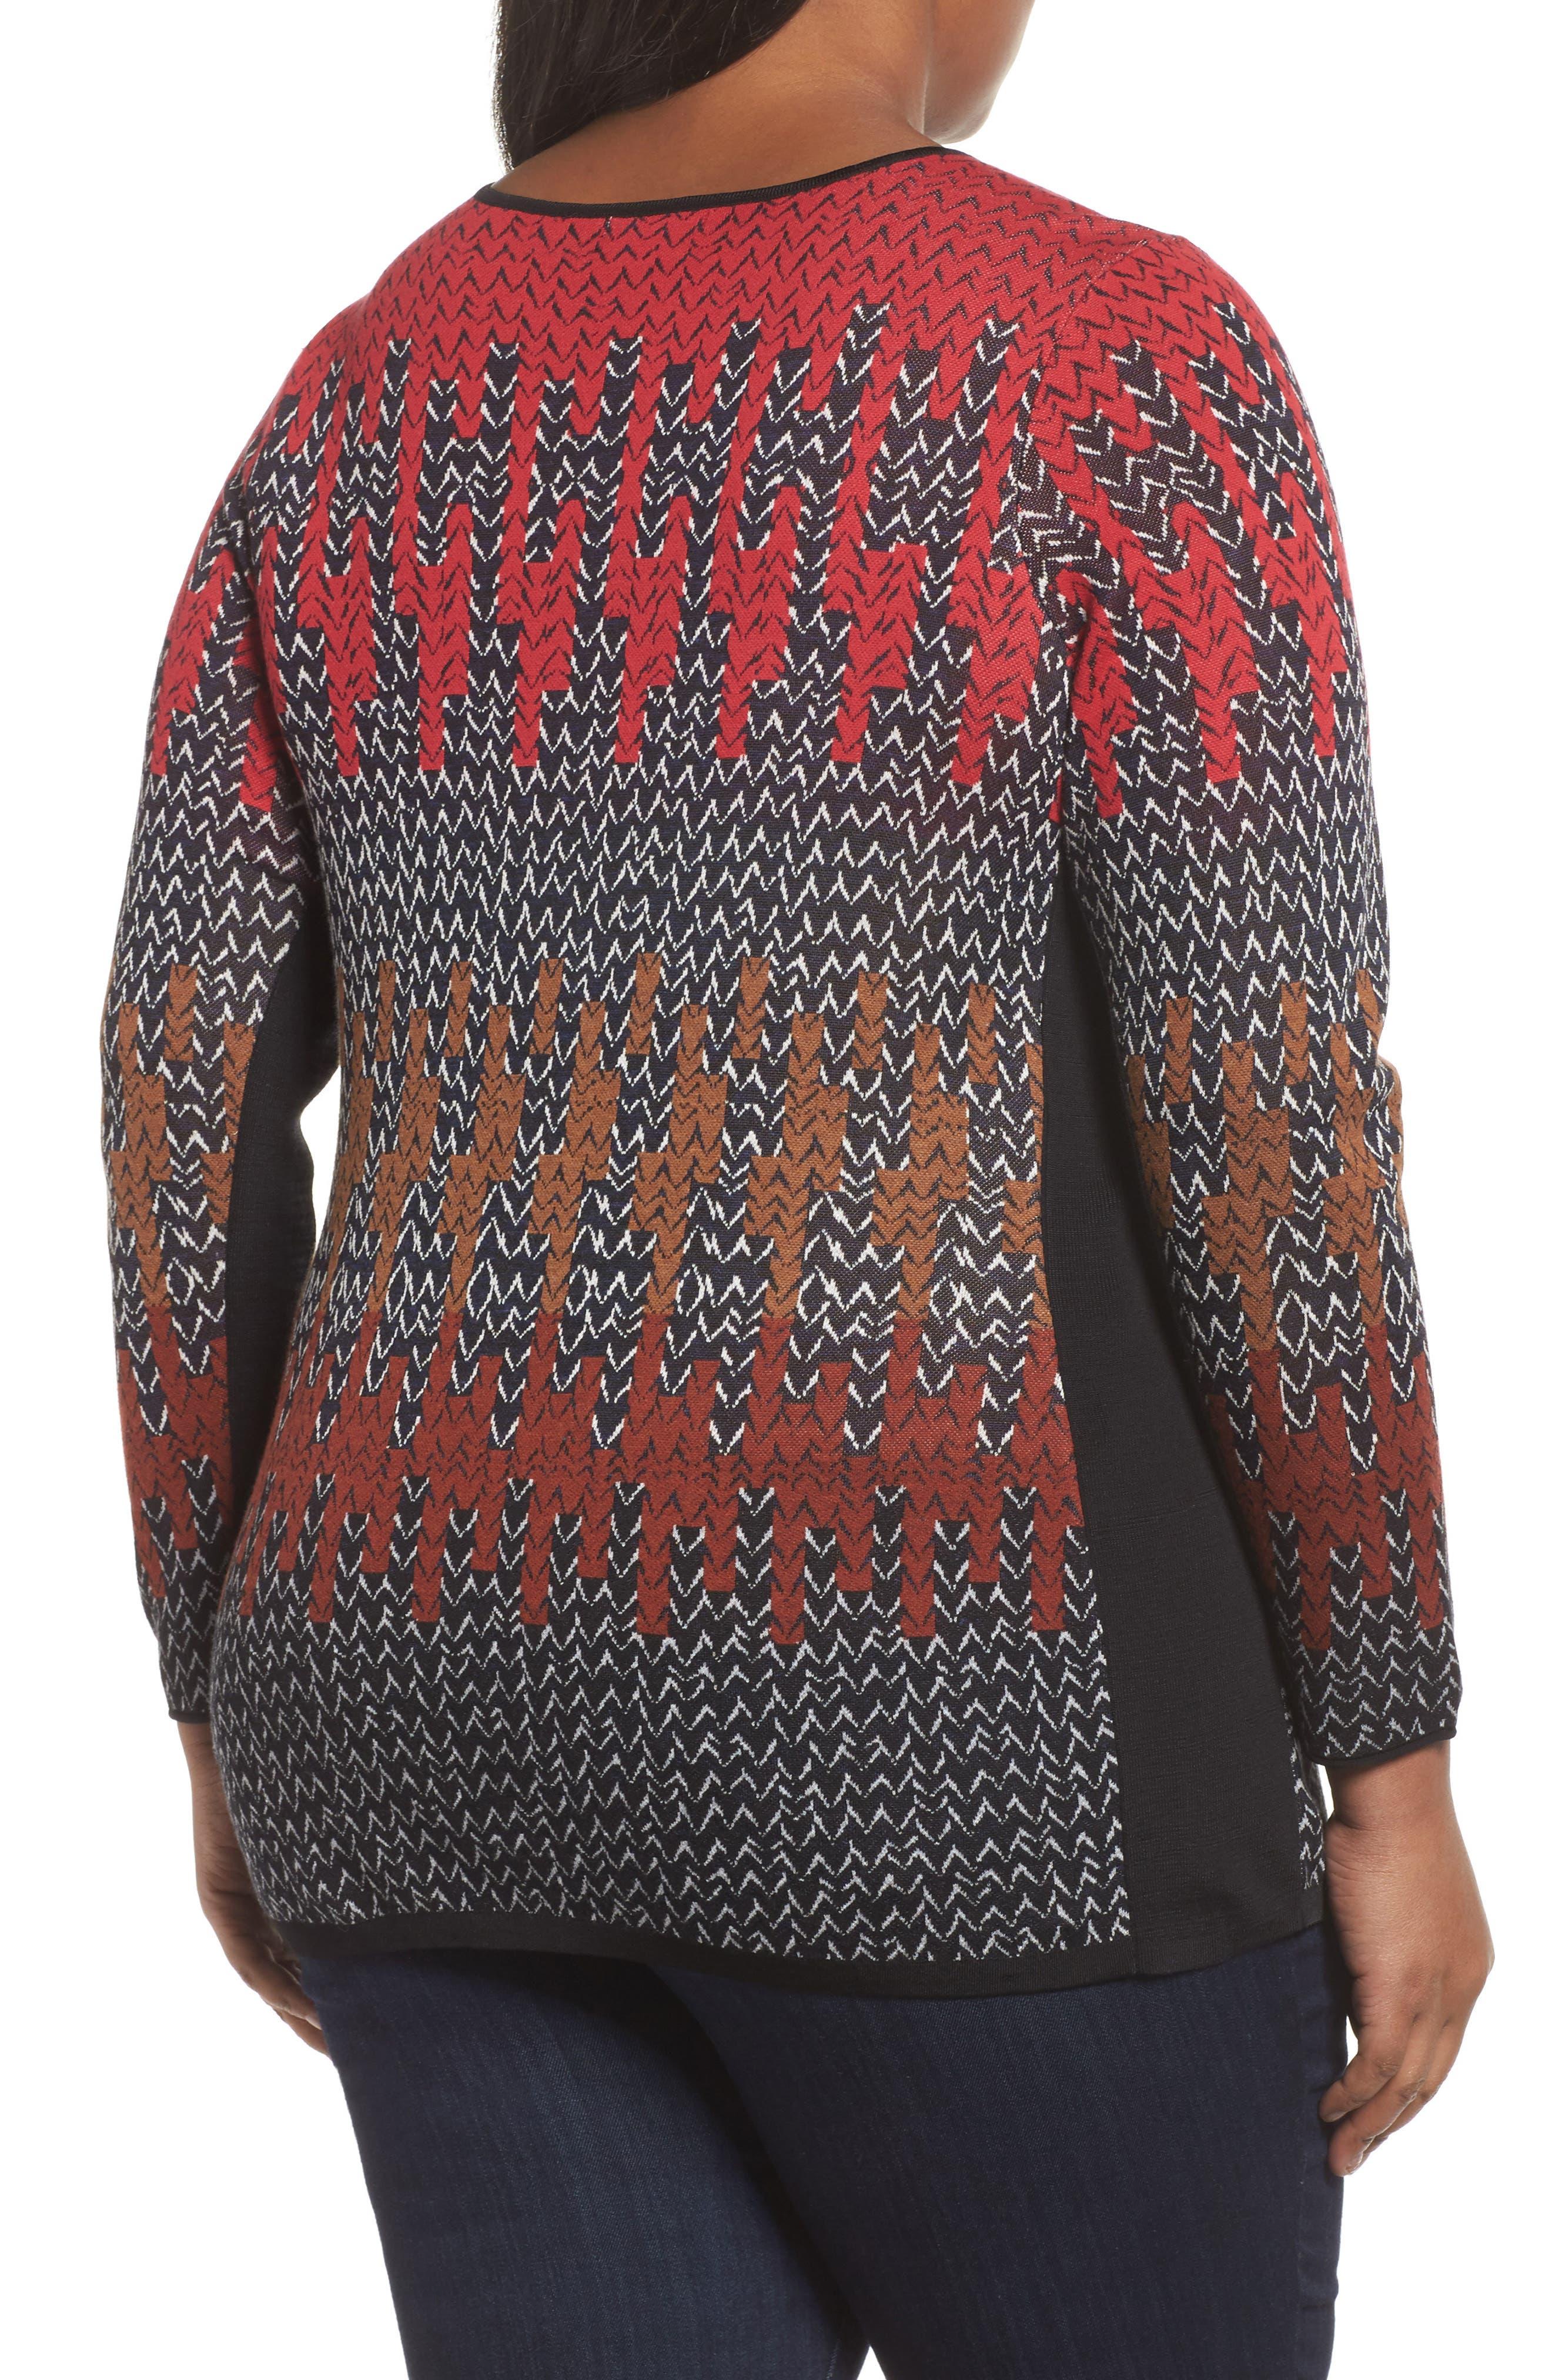 Sunset Sweater,                             Alternate thumbnail 2, color,                             Multi